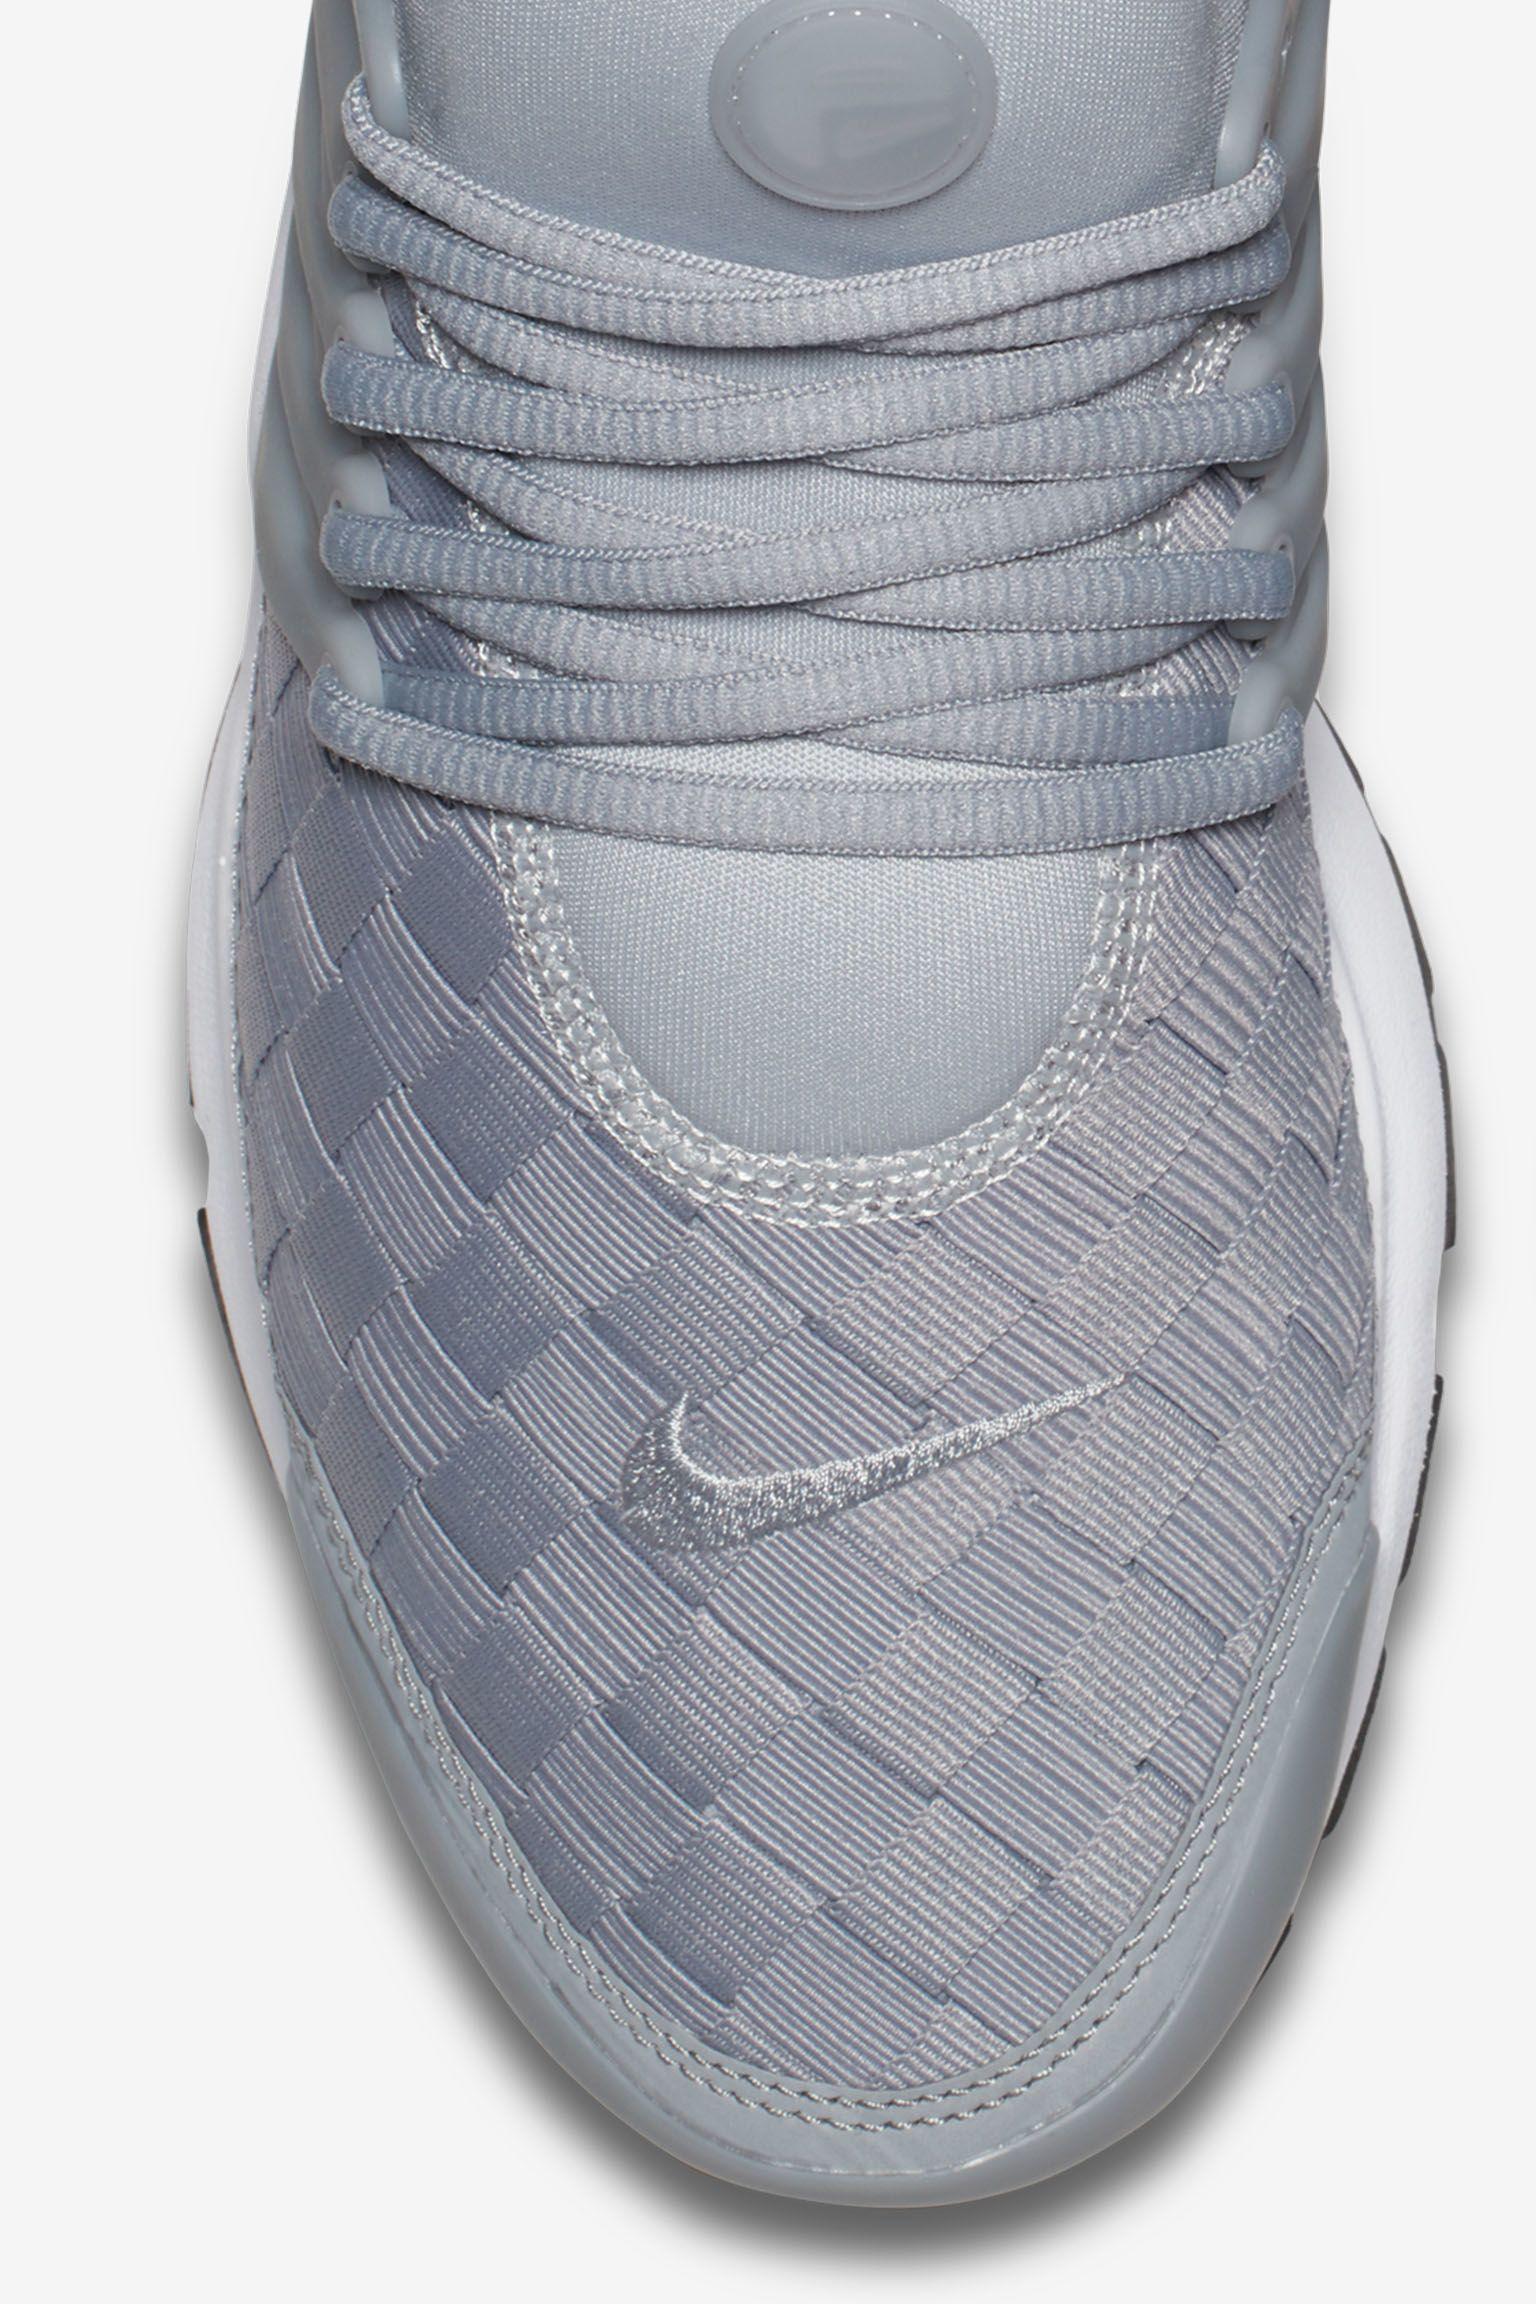 Nike Air Presto SE 'Wolf Grey' Release Date